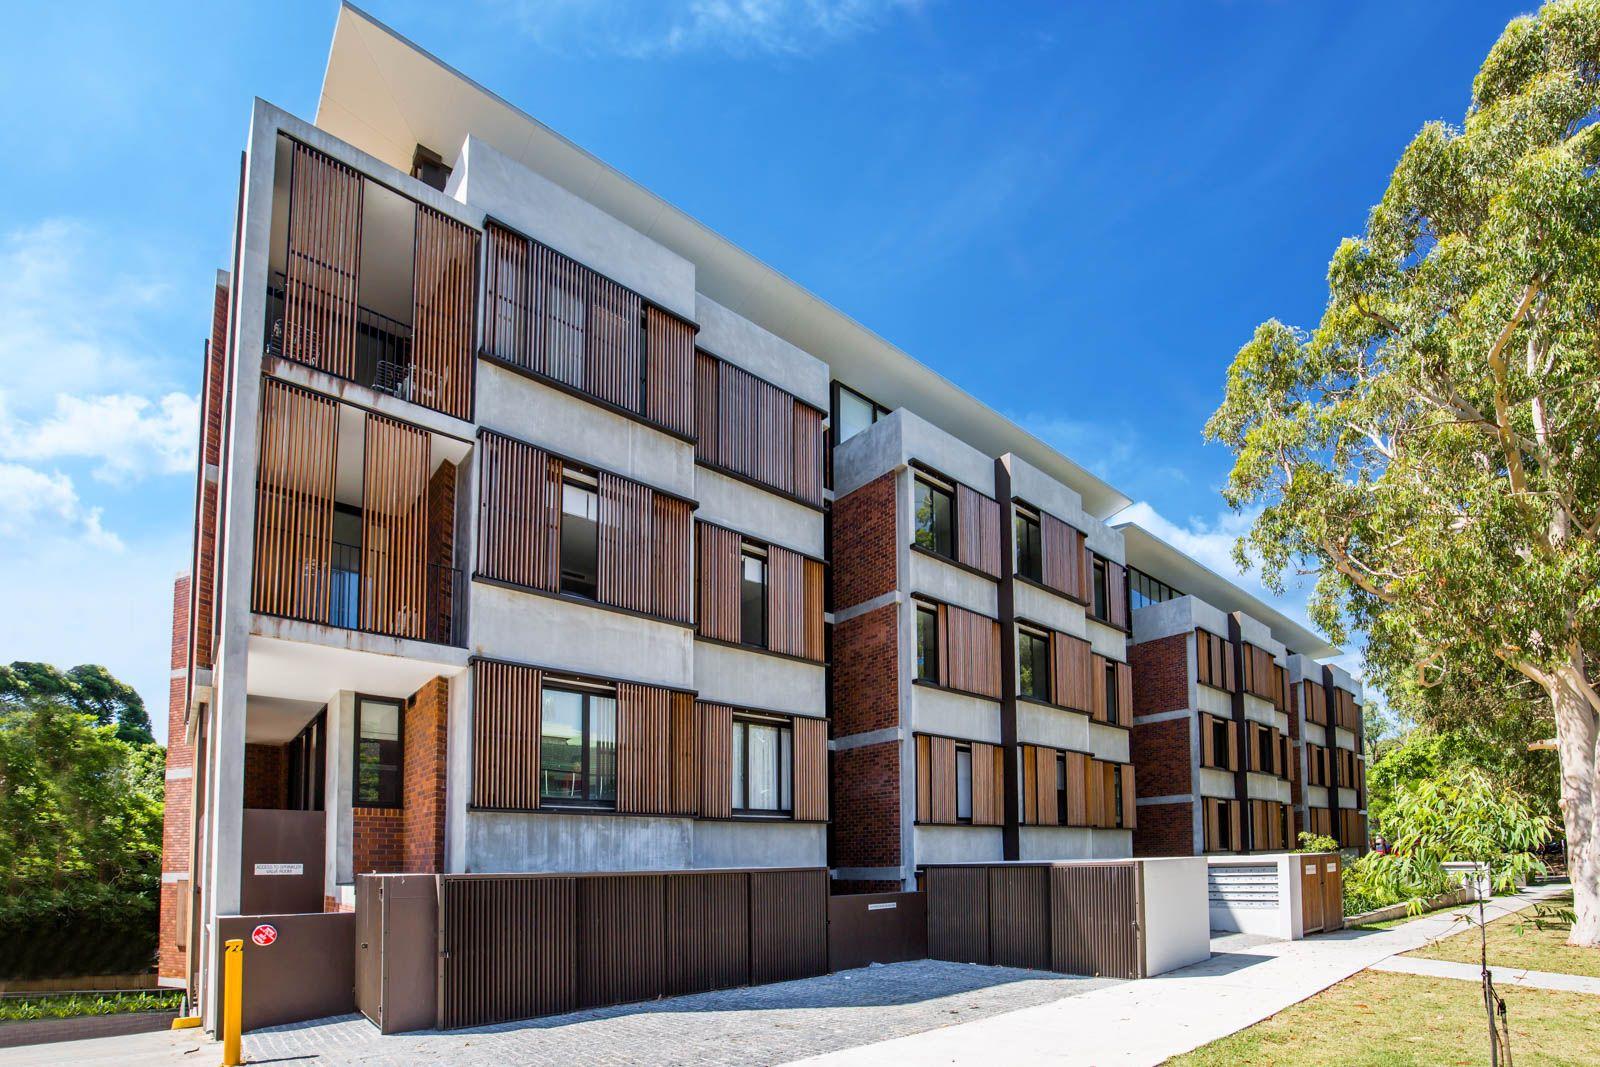 18/3-9 Finlayson Street, Lane Cove NSW 2066, Image 0